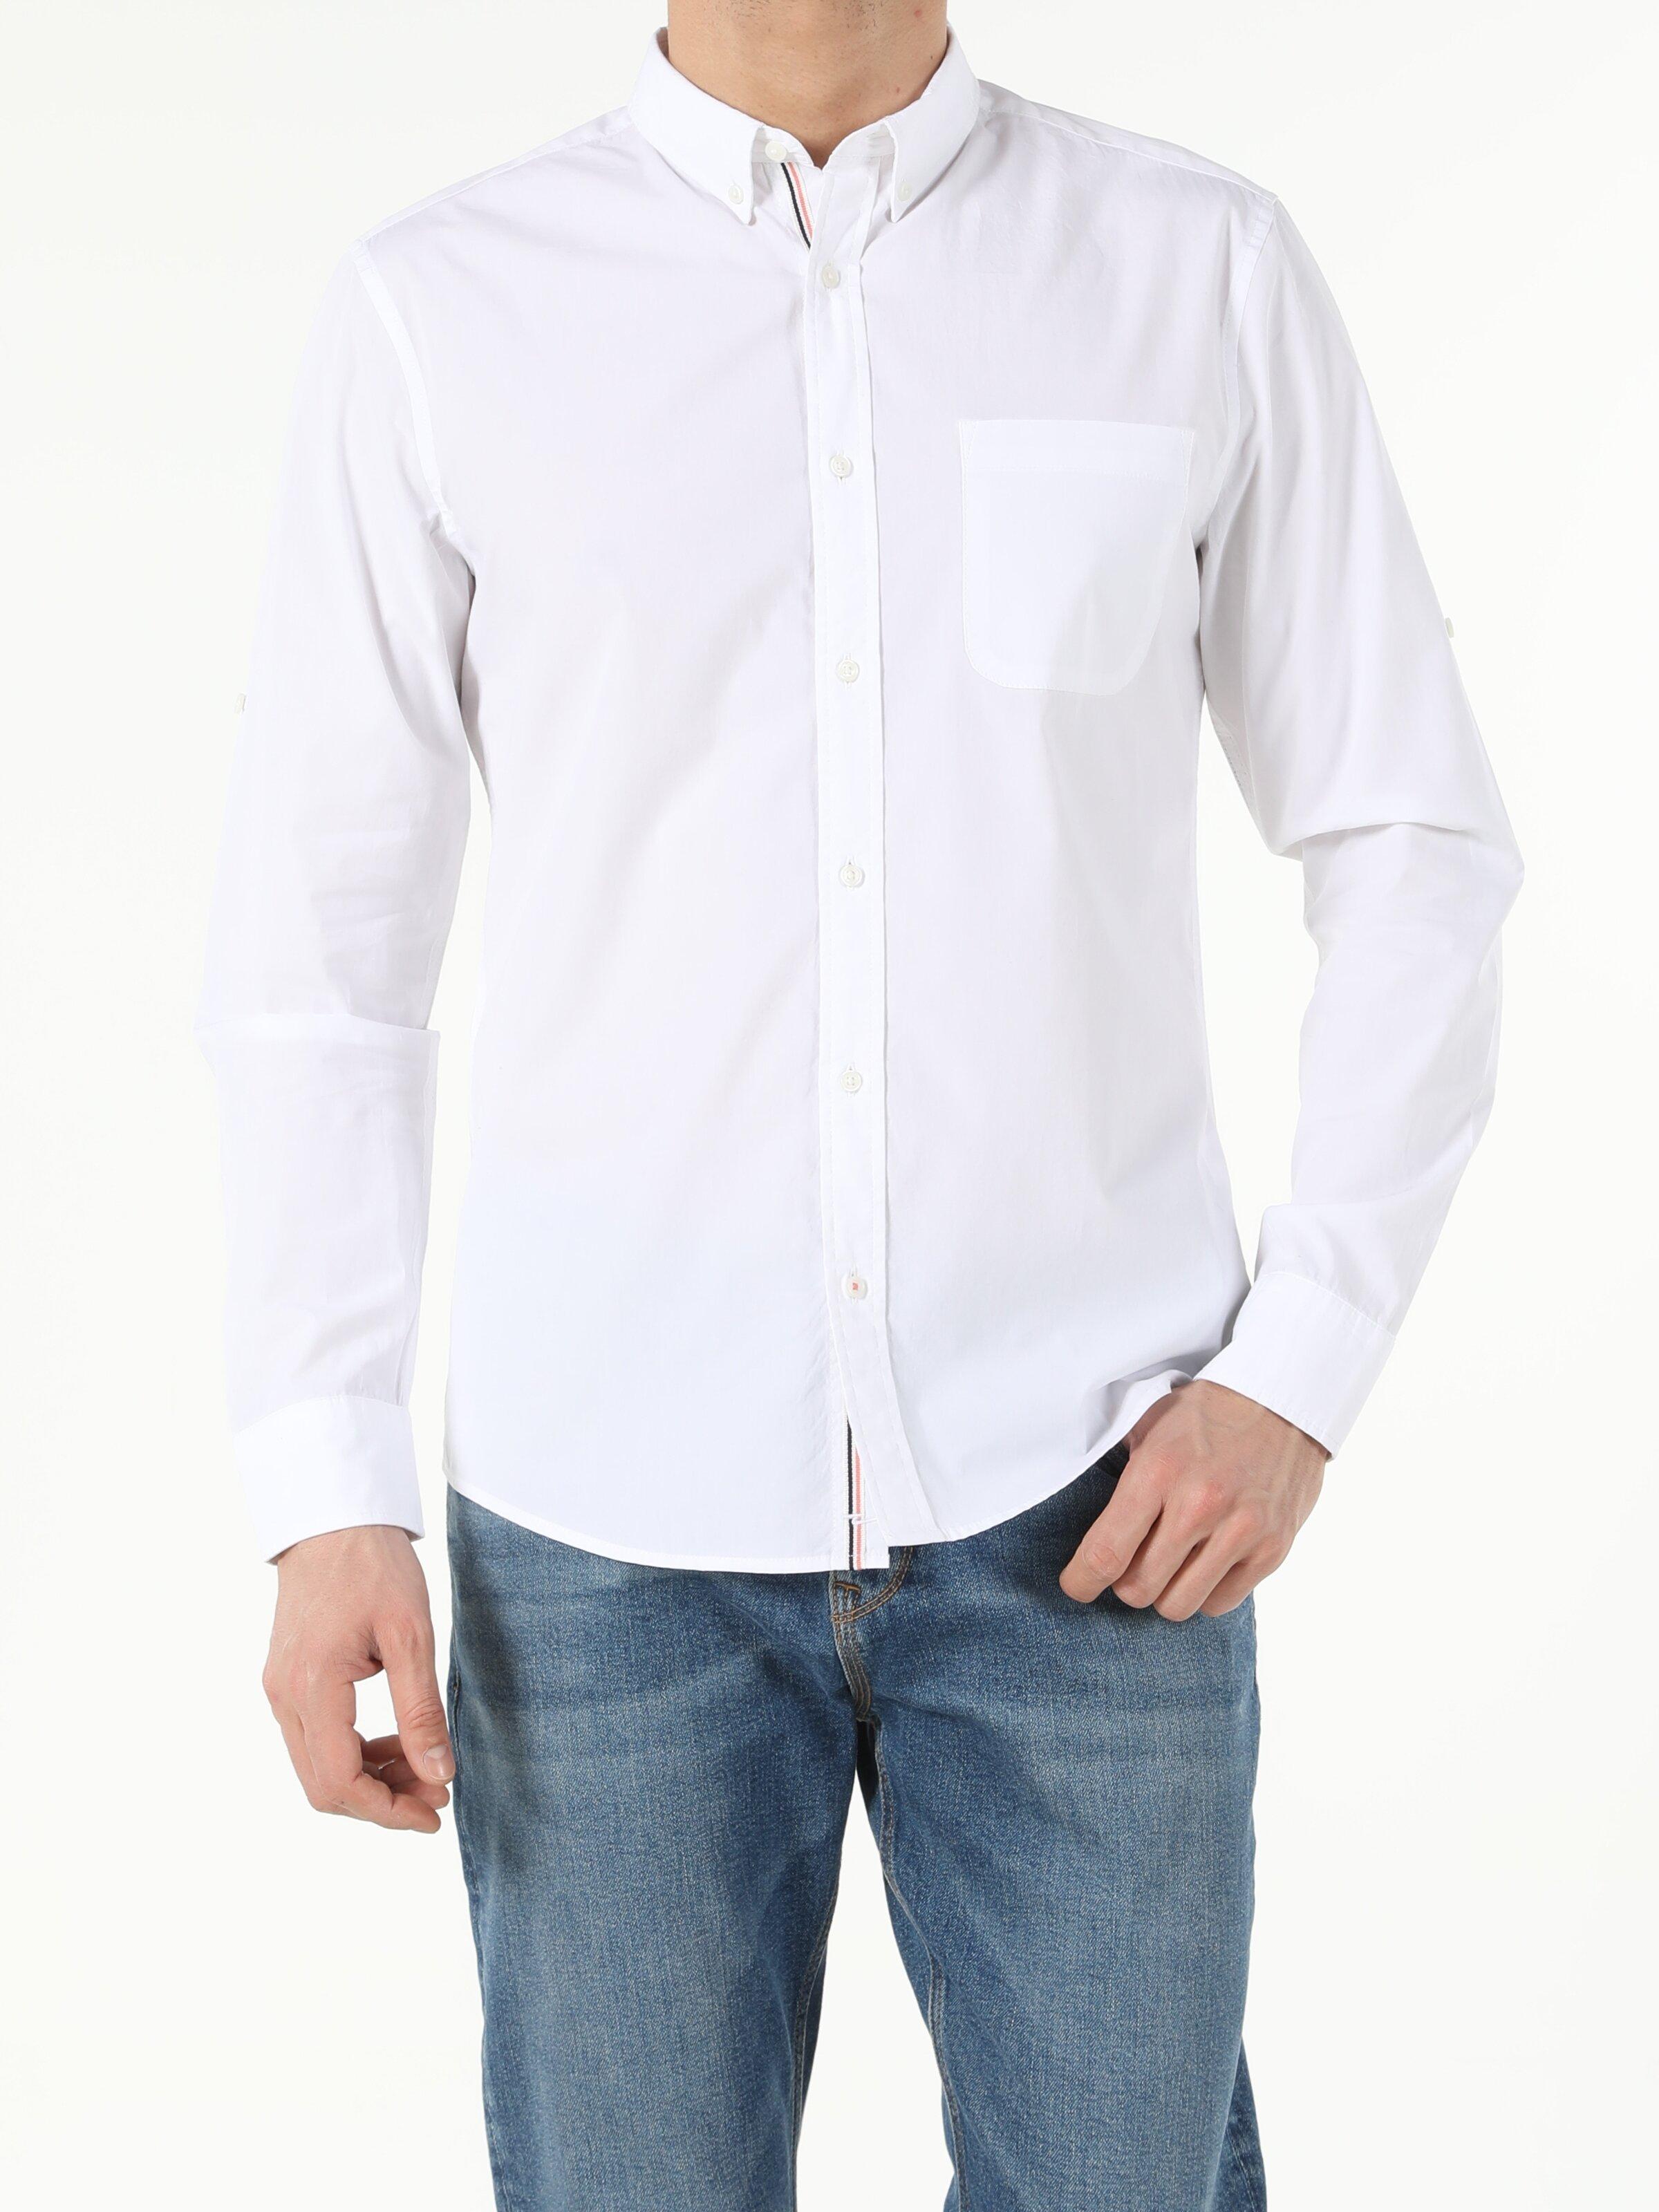 Beyaz Slim Fit Shirt Neck  Erkek Uzun Kol Gömlek